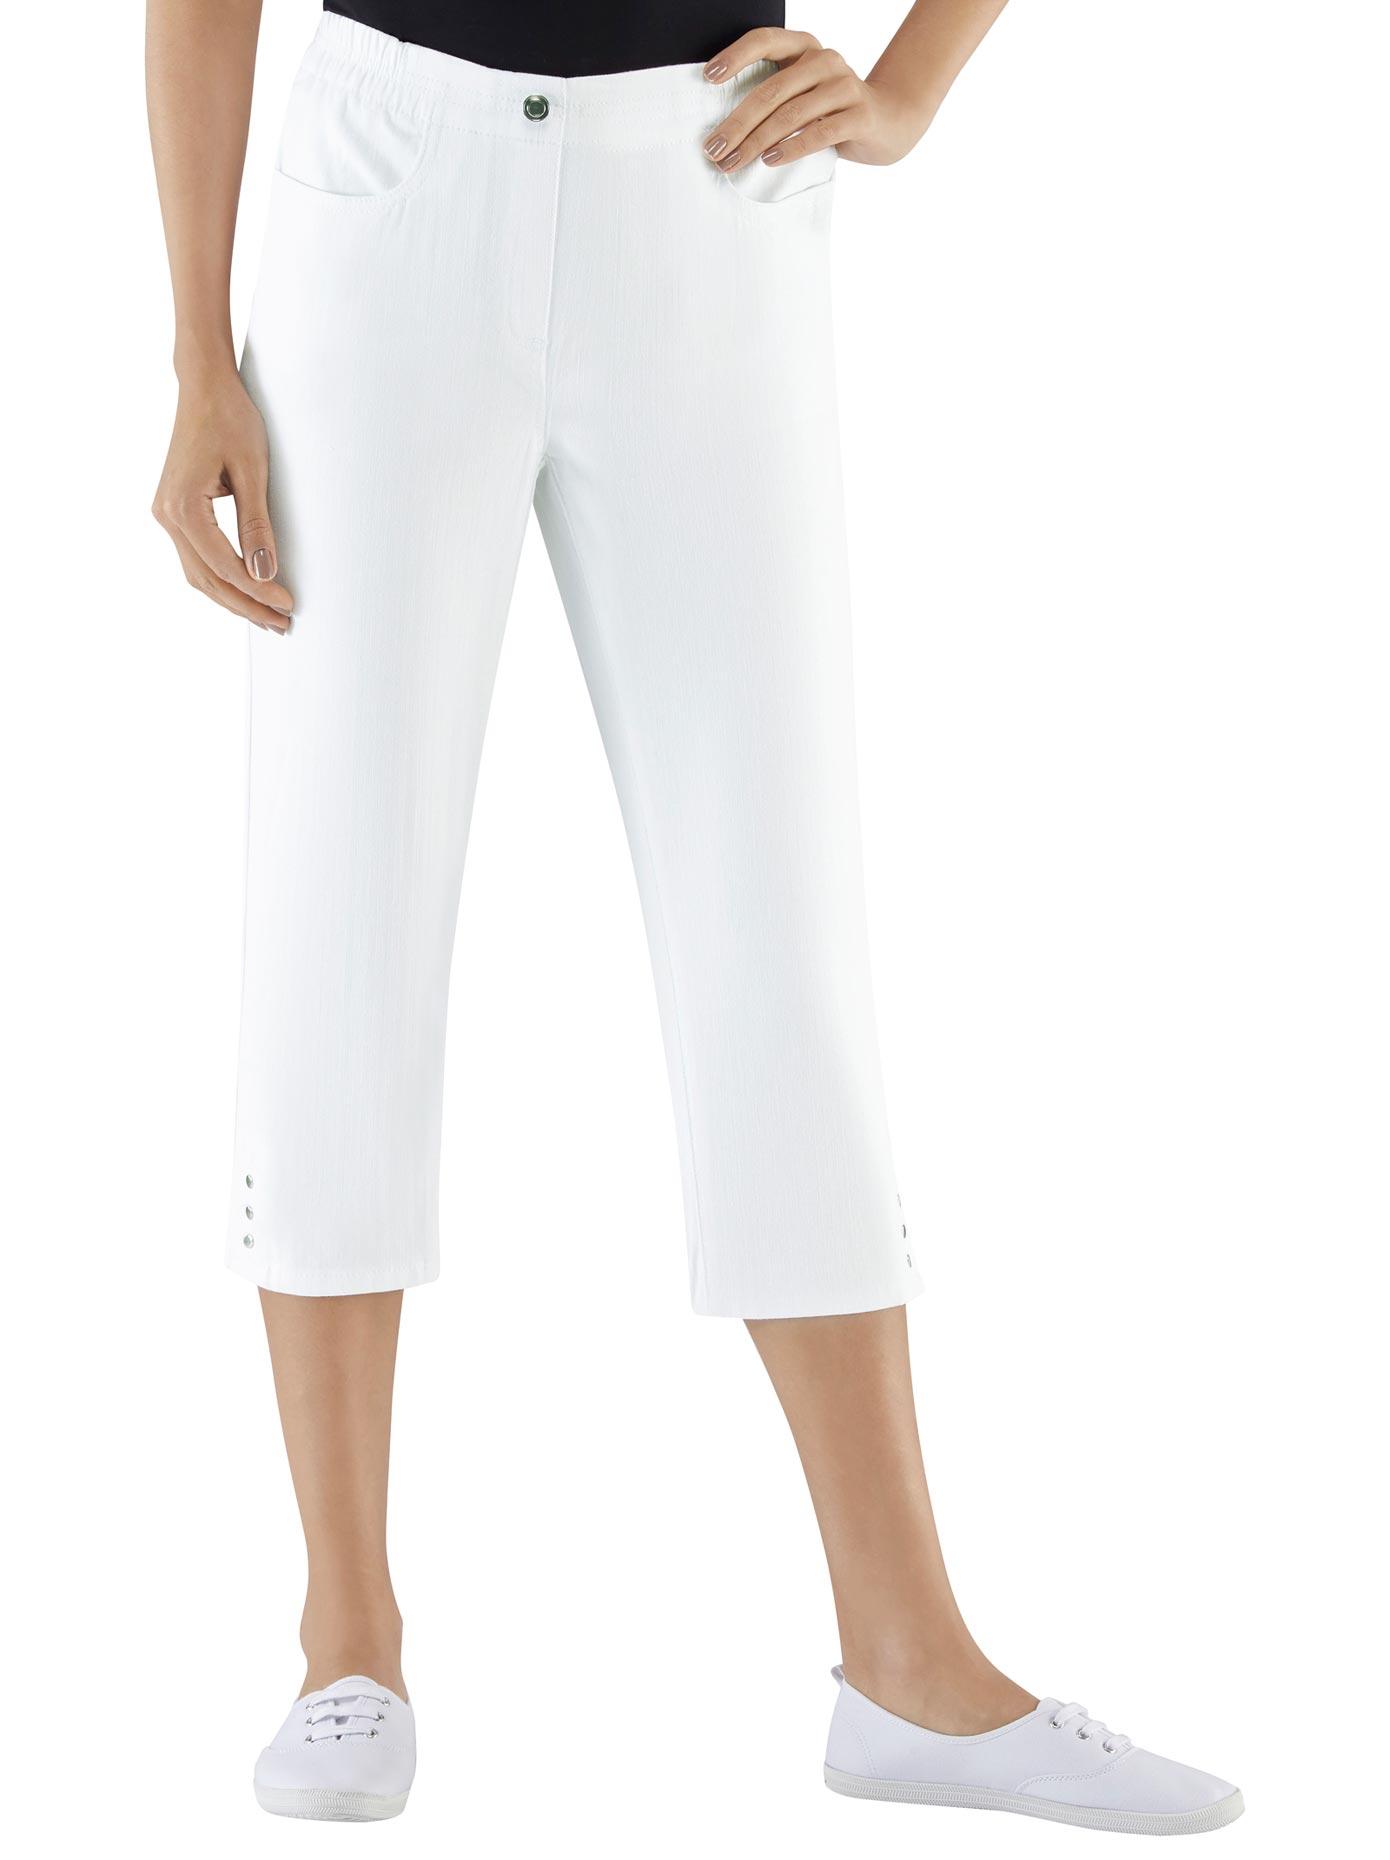 Classic Basics Capri-Jeans mit Rundum-Dehnbund | Bekleidung > Jeans > Caprijeans | Weiß | Jeans | Classic Basics